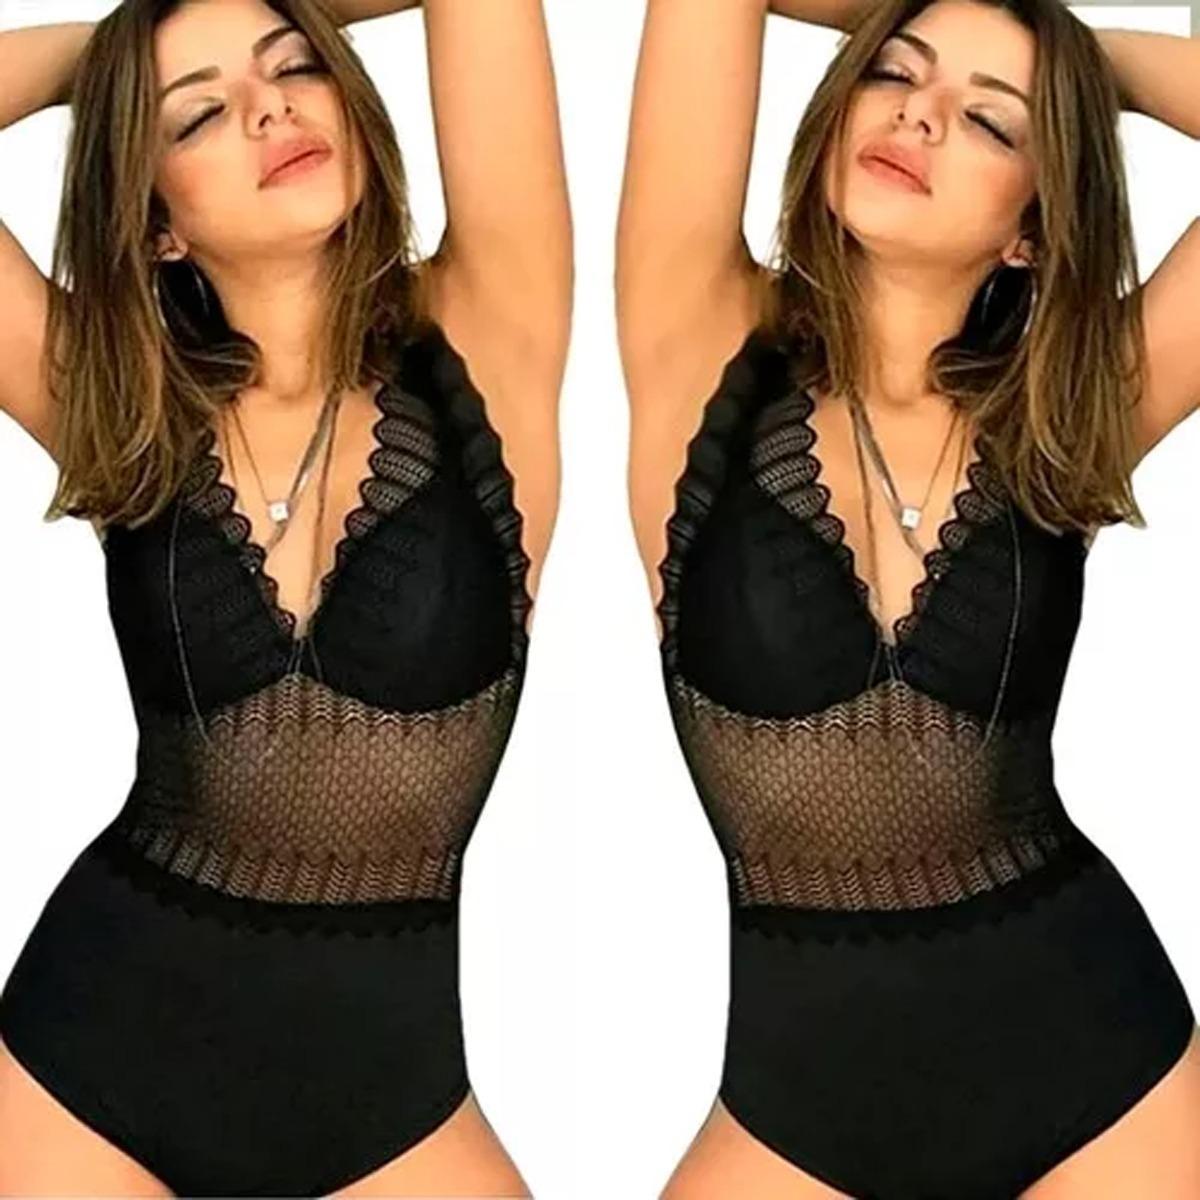 065efe9ed body feminino renda modelo instagran. Carregando zoom.